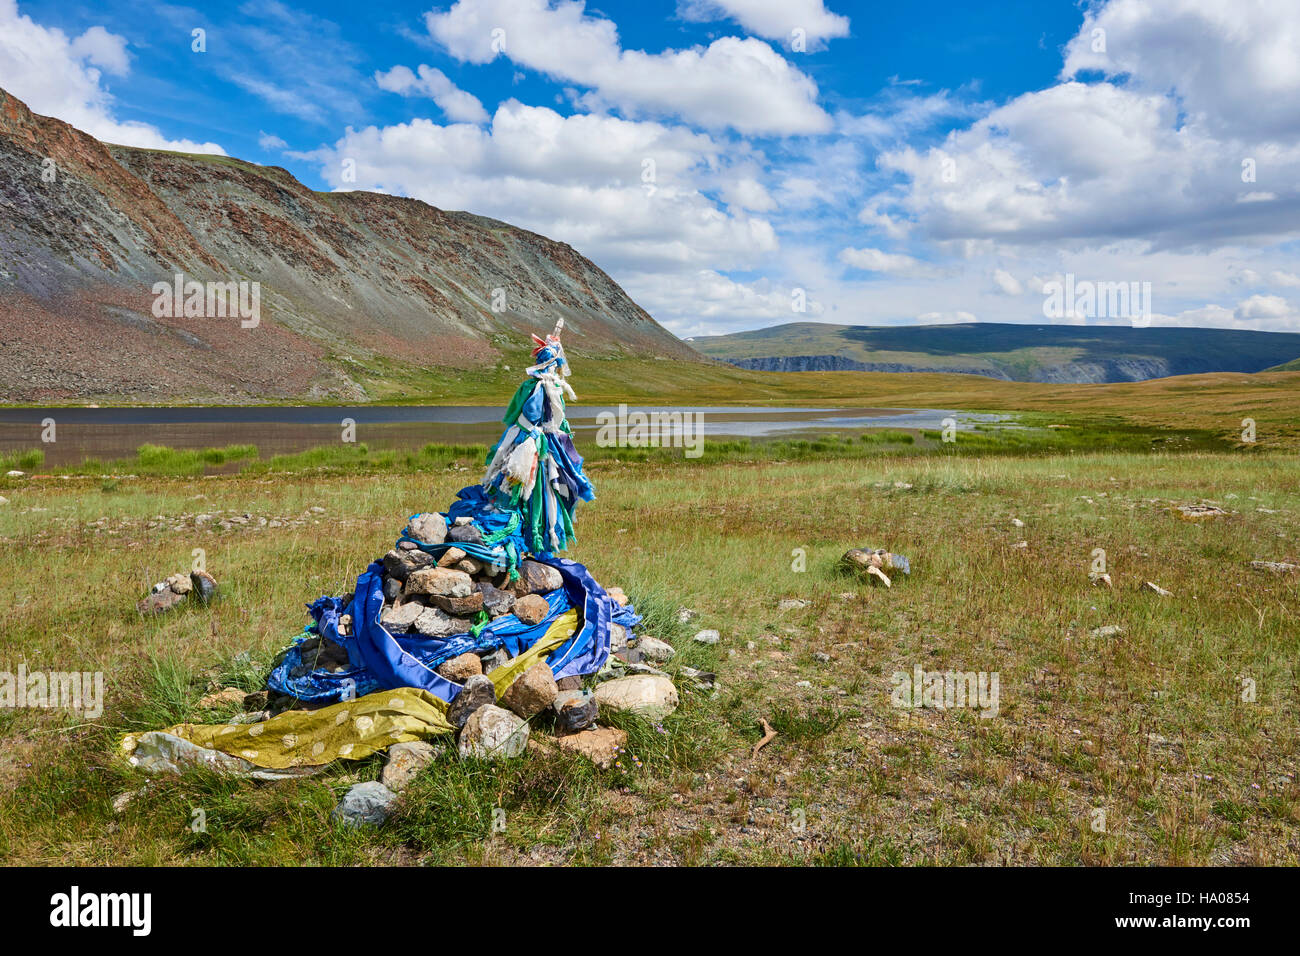 Mongolia, Bayan-Ulgii province, western Mongolia, National Parc of Tavan Bogd, shamanic ovoo Stock Photo